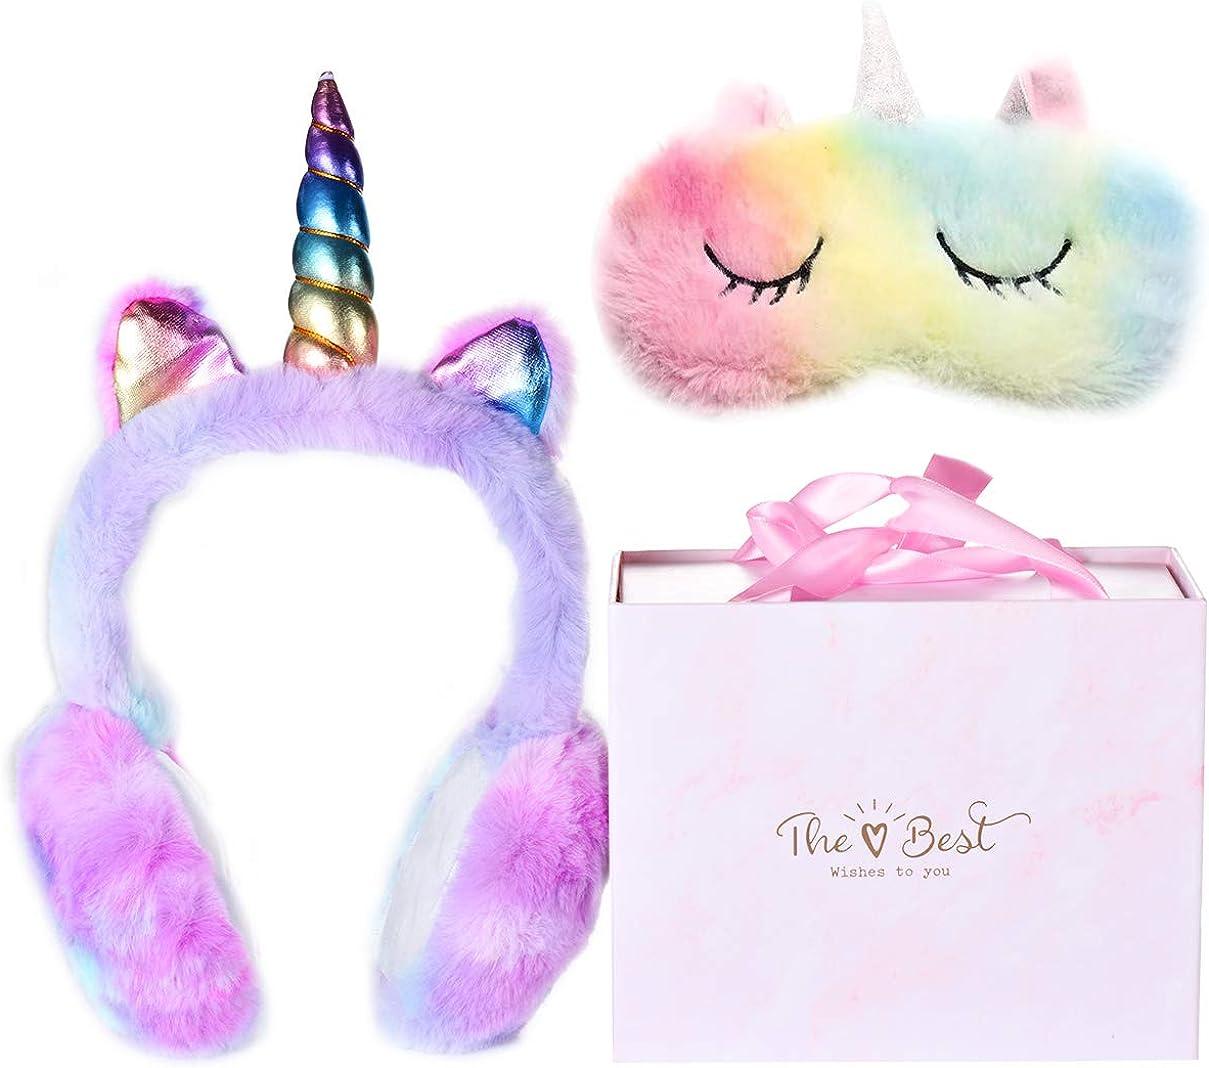 Winter Plush Earmuffs,Foldable Portable Cute Panda Ears Sequin Plush Warm Head Mounted Outdoor Cycling Cold Protection Ear Warmers Girls Pink